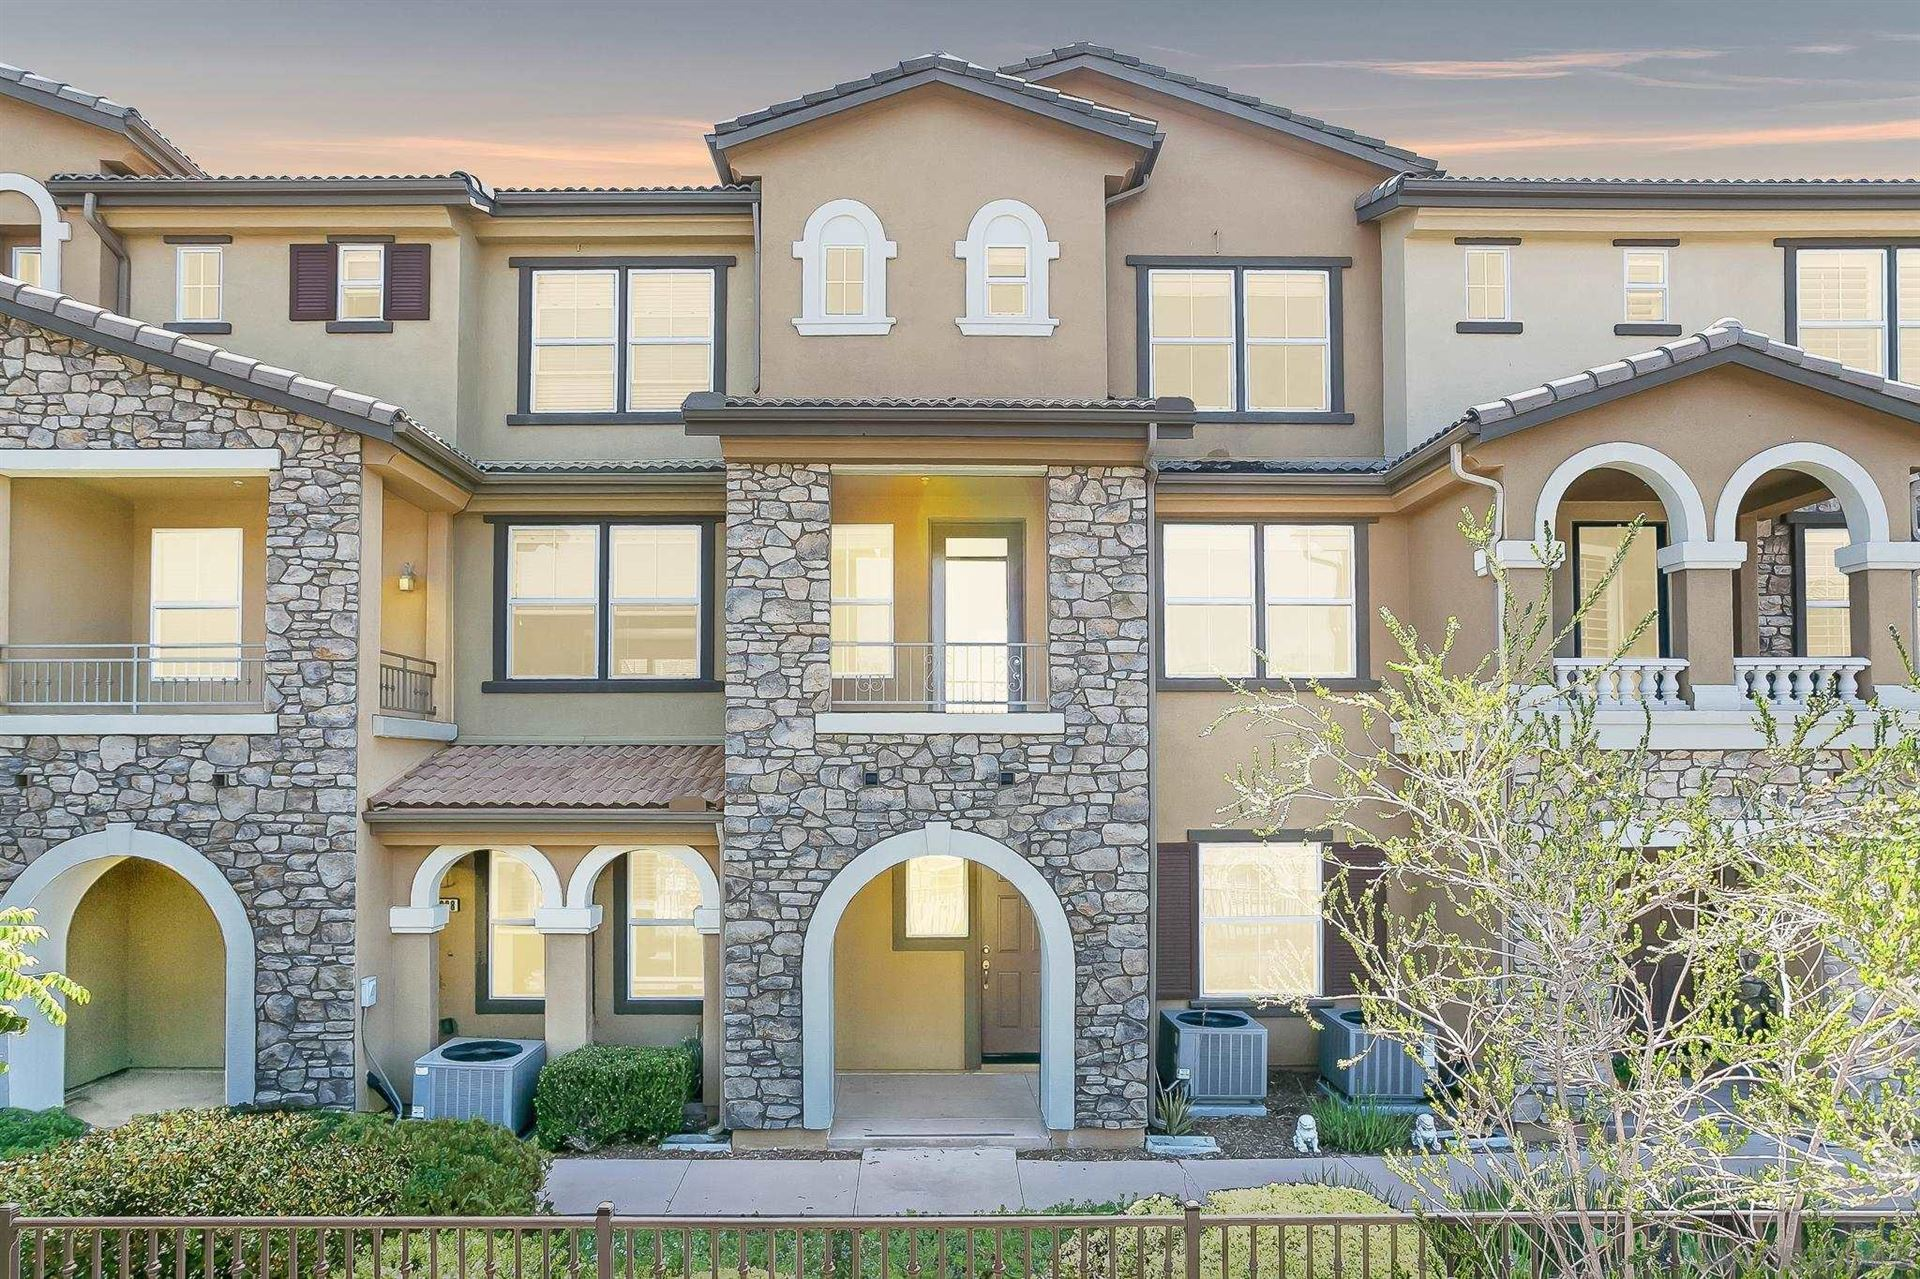 Photo of 1807 Montilla St, Santee, CA 92071 (MLS # 210018141)